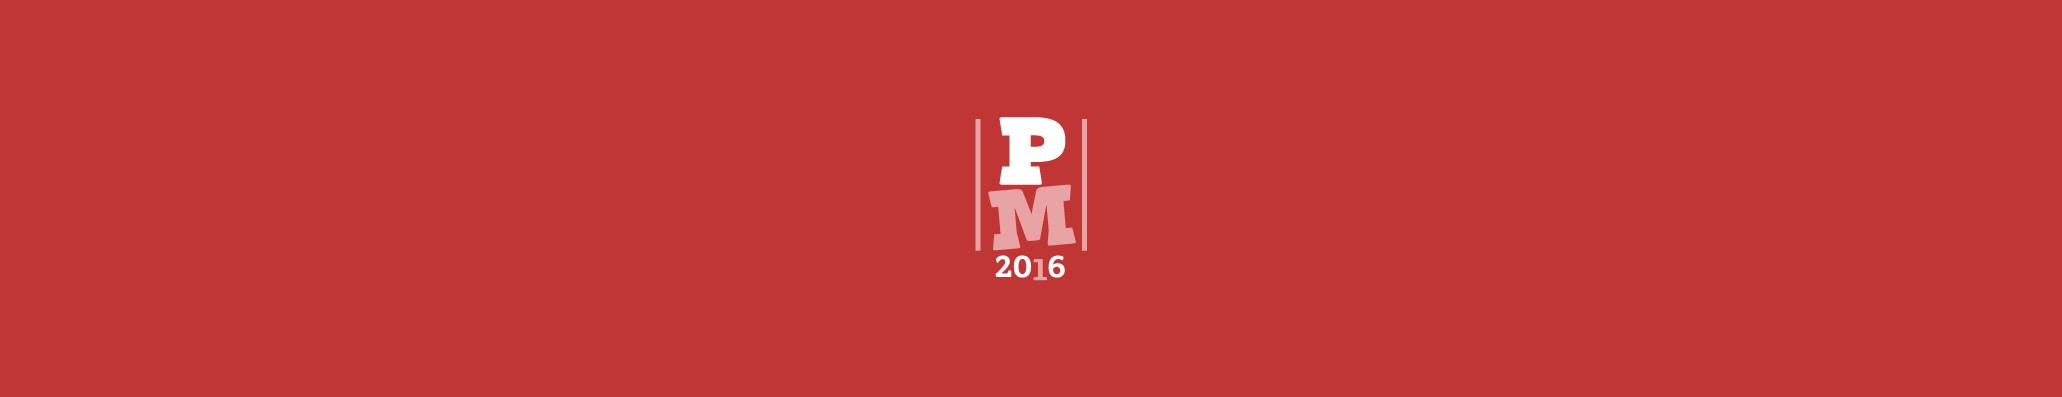 PM_banner-2